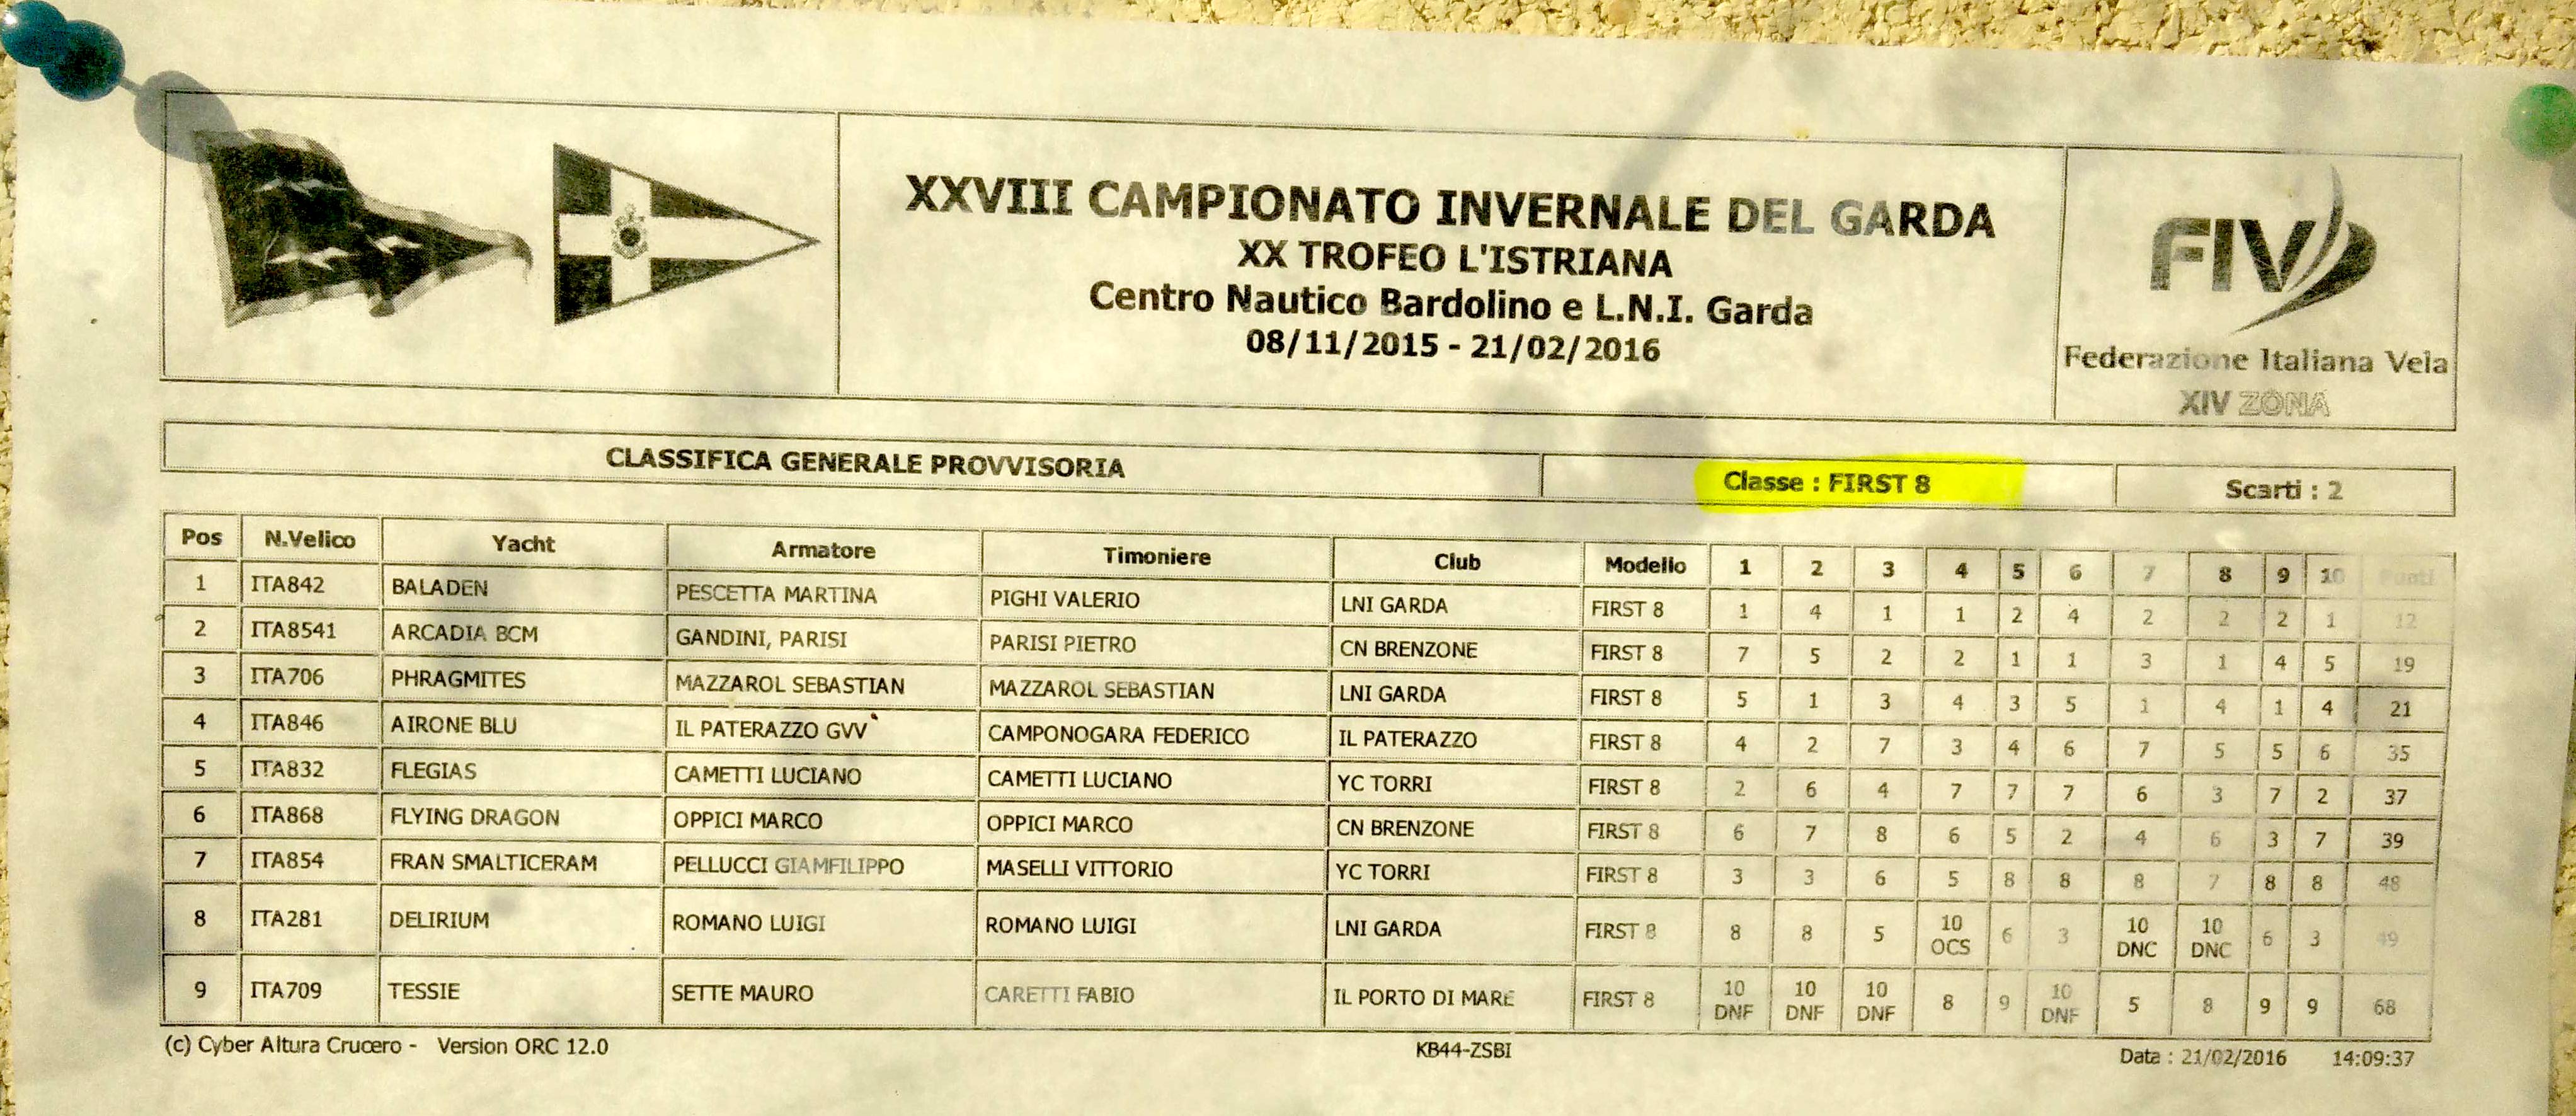 ClassificaFinale_CamionatoInvernale2015-15